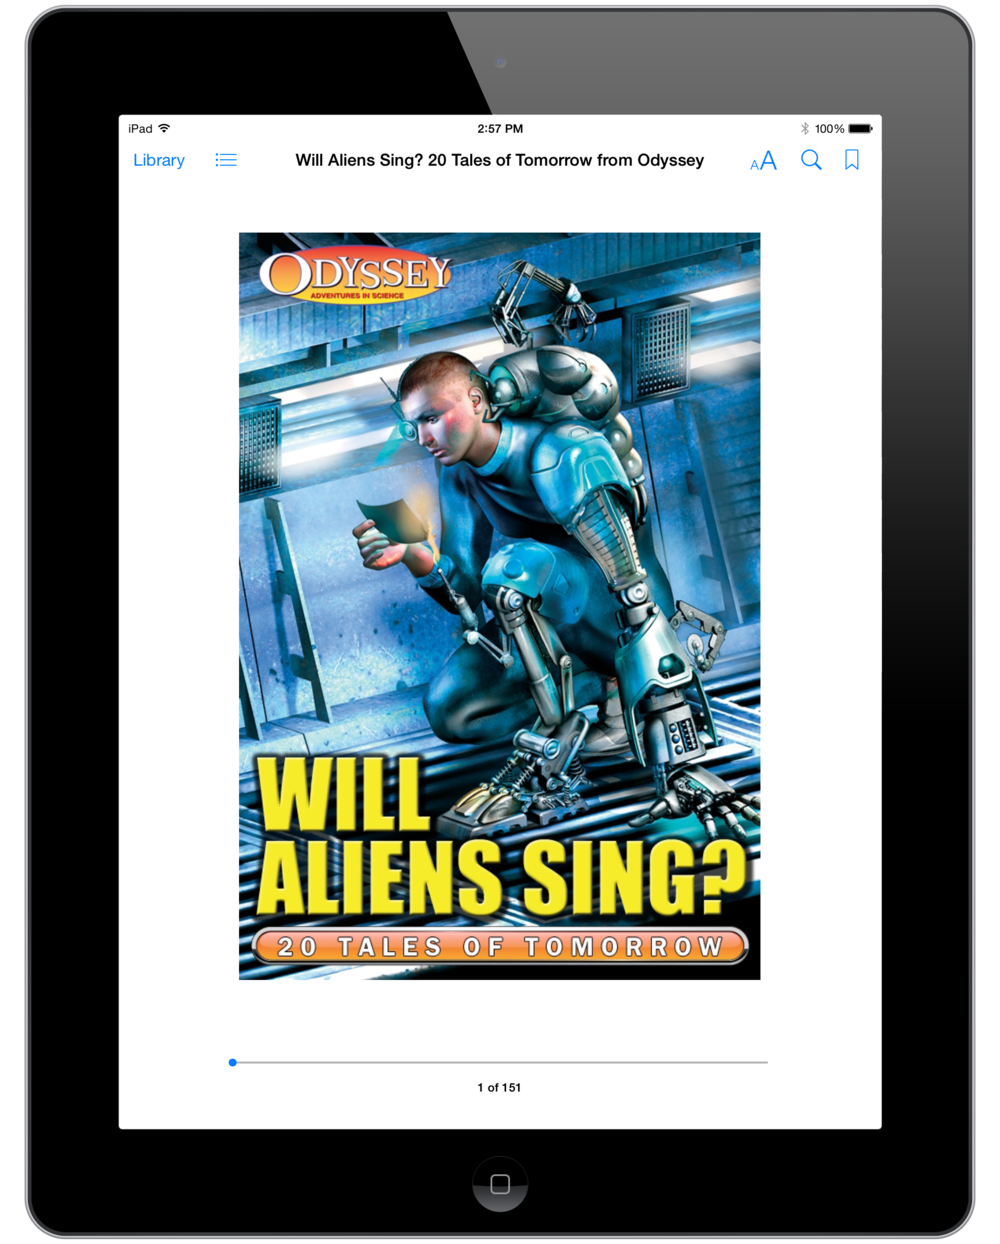 Will Aliens Sing?